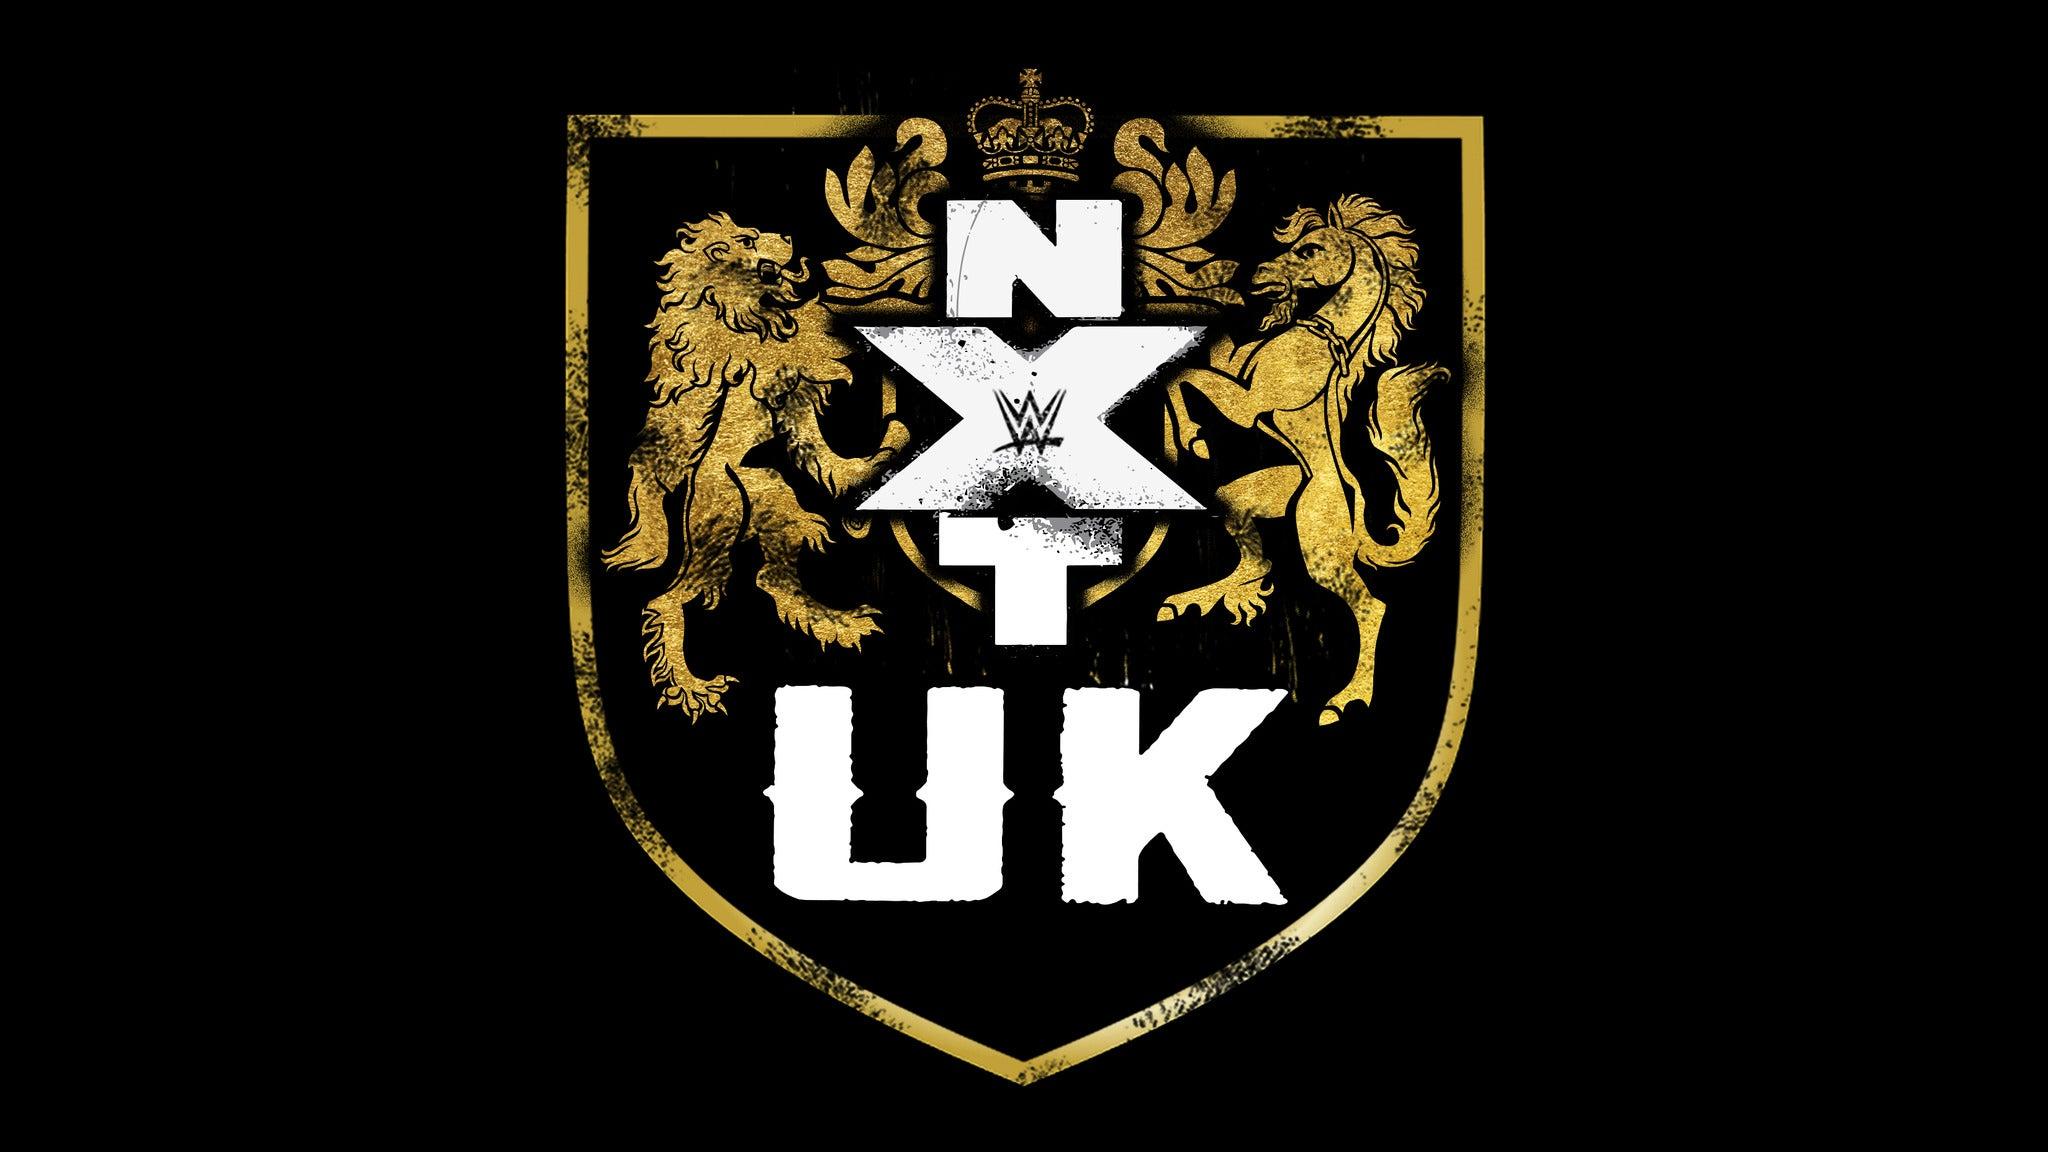 Wwe Nxt Uk Live Glasgow 2 Day Ticket tickets (Copyright © Ticketmaster)